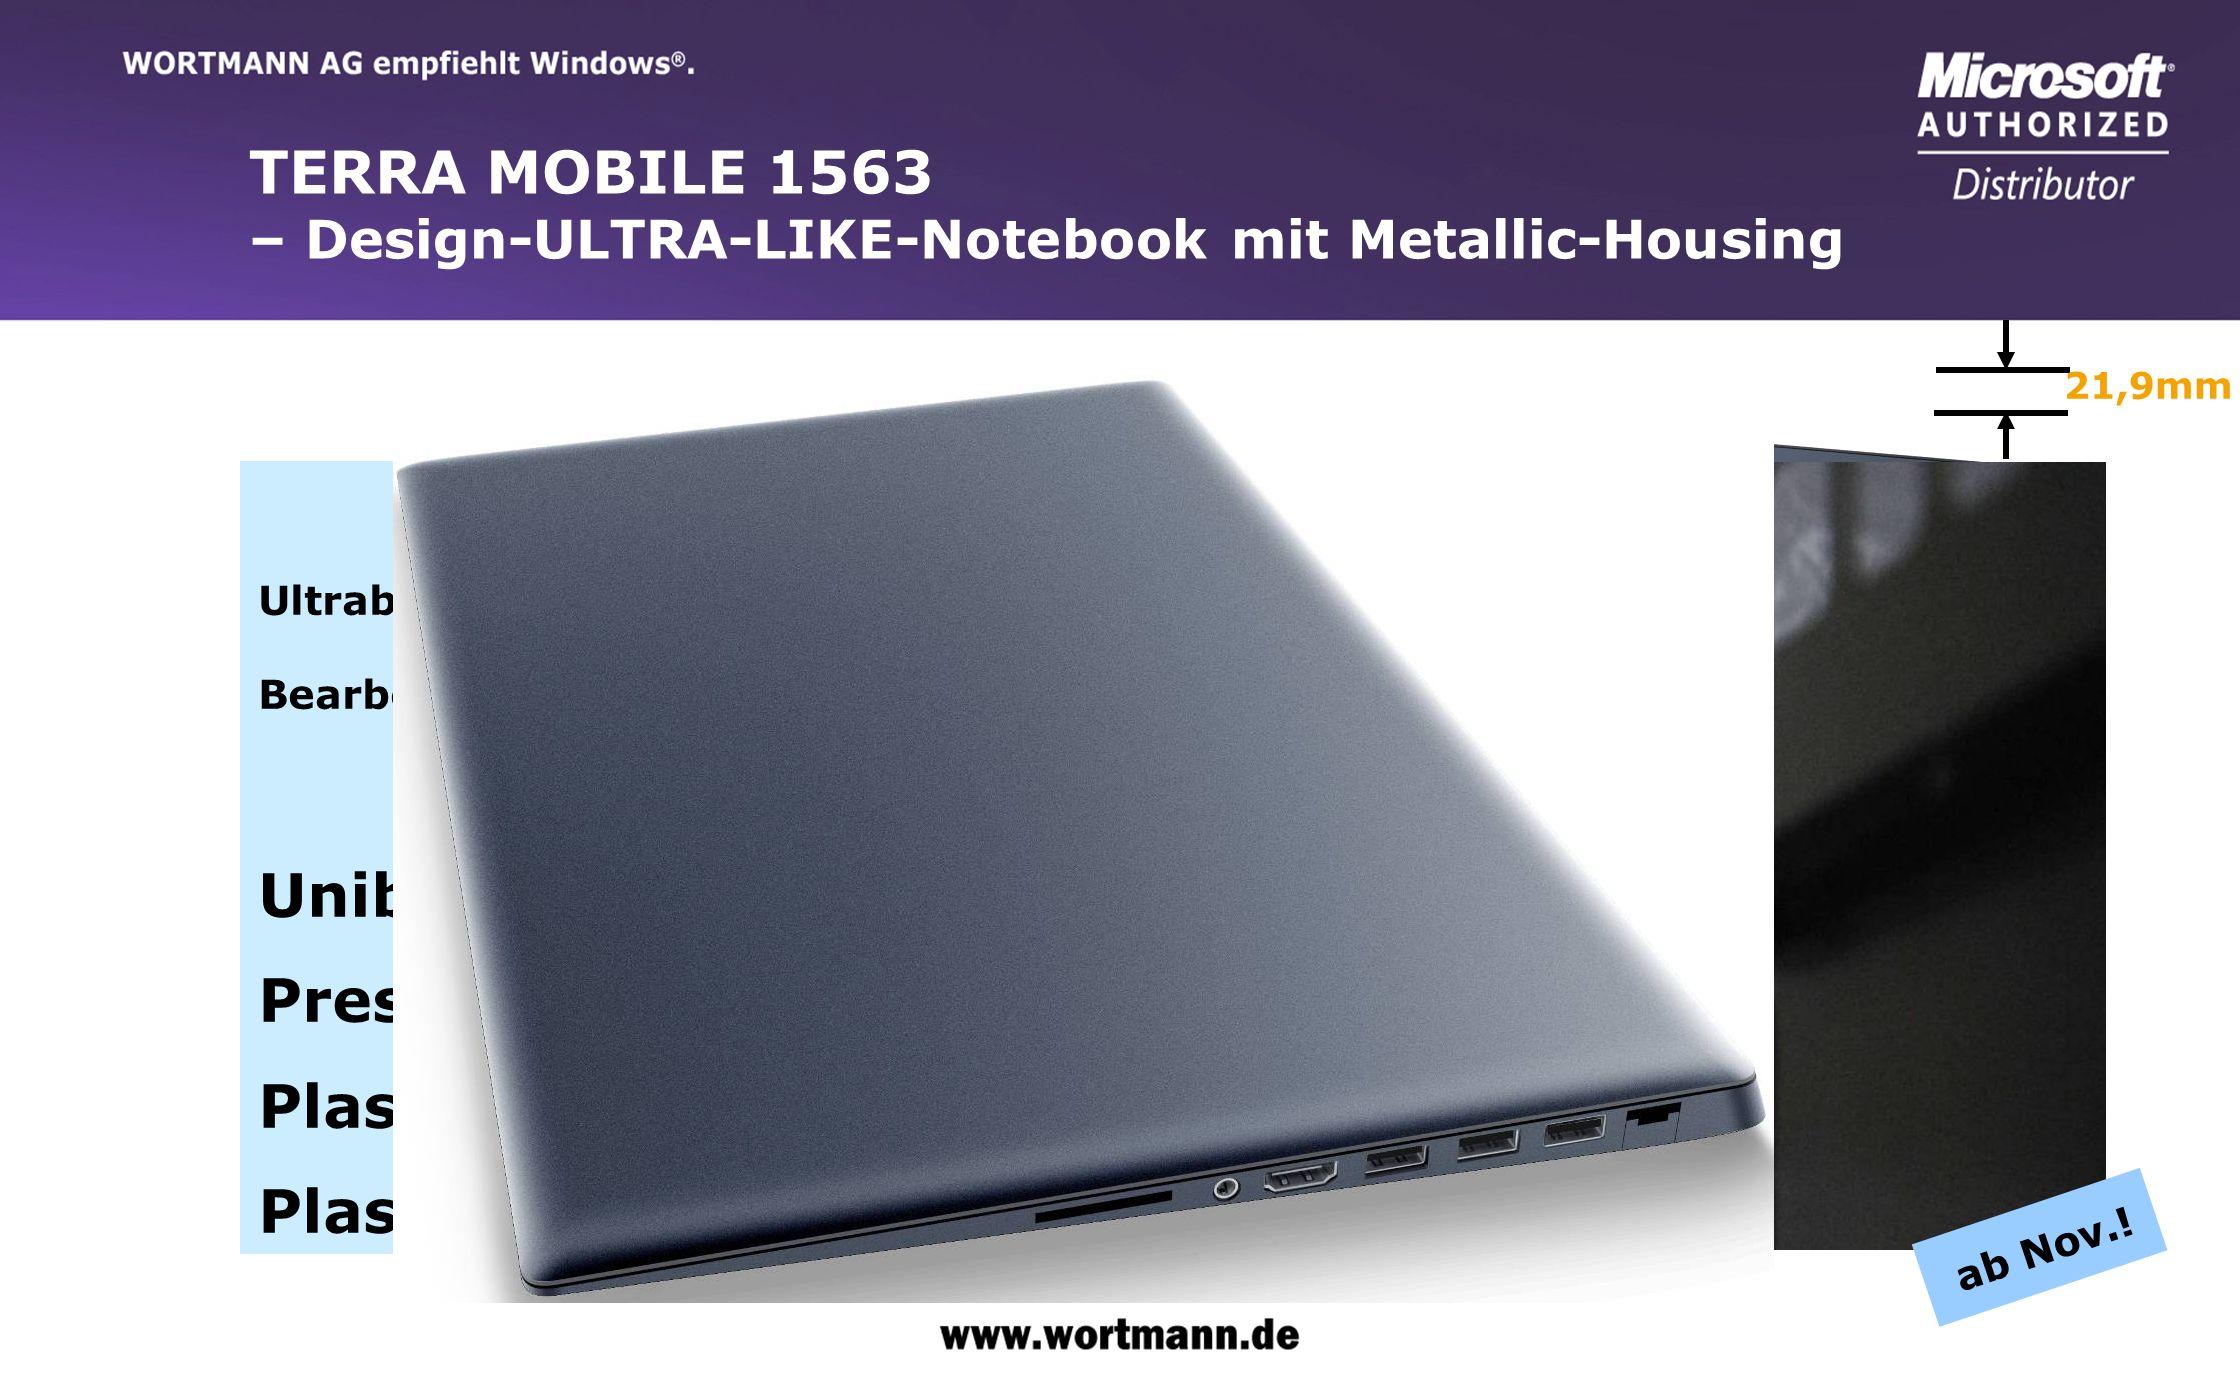 www.wortmann.de TERRA MOBILE 1563 – Design-ULTRA-LIKE-Notebook mit Metallic-Housing 15,6 HD (1366x768)Ultra Slim Display Gehäuse aus Alluminium/Unibod